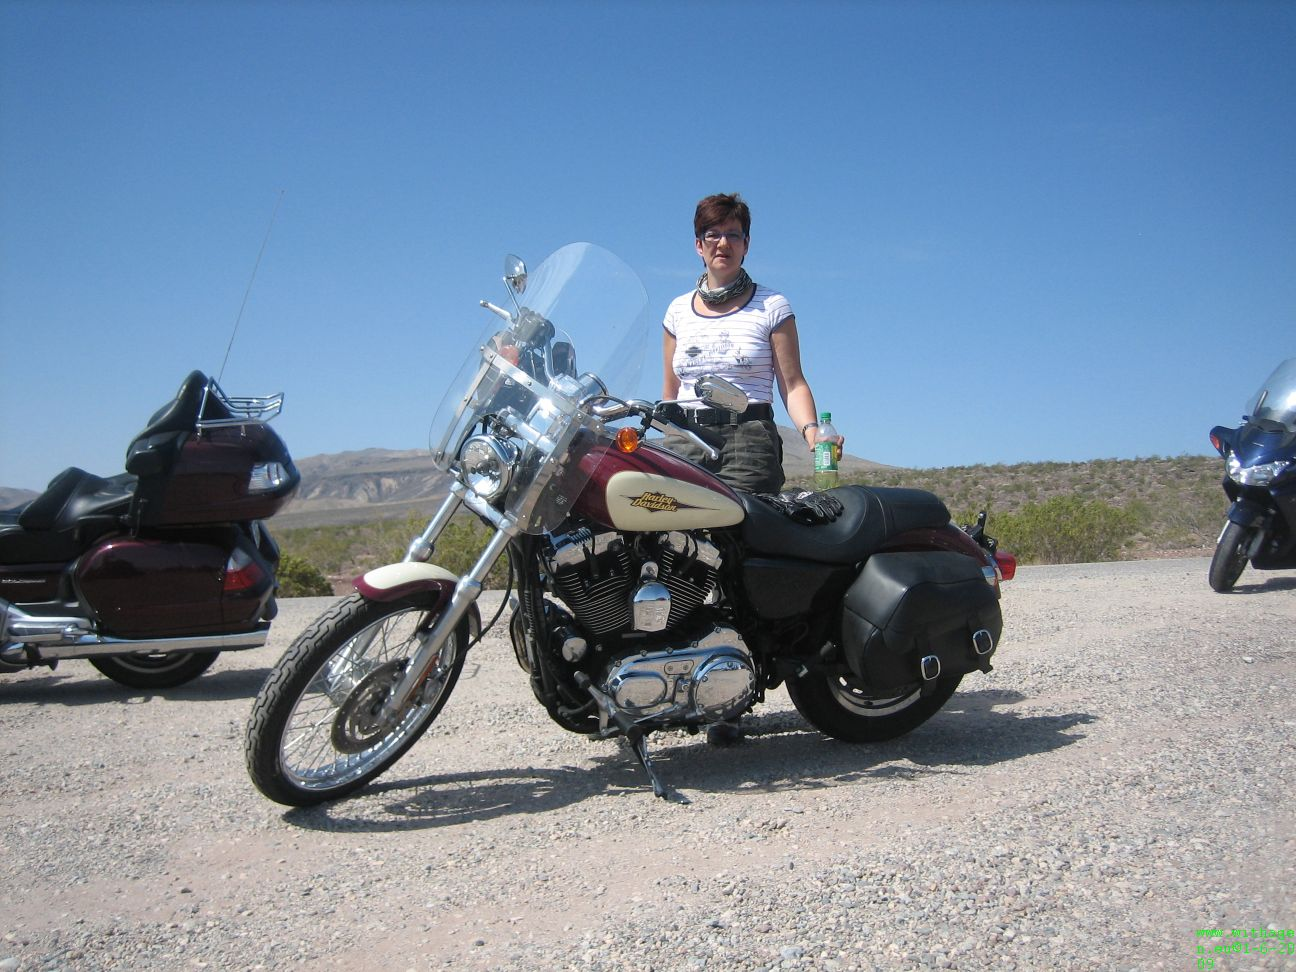 Poseren met xl1200 in Death Valley 110 degrees (44)